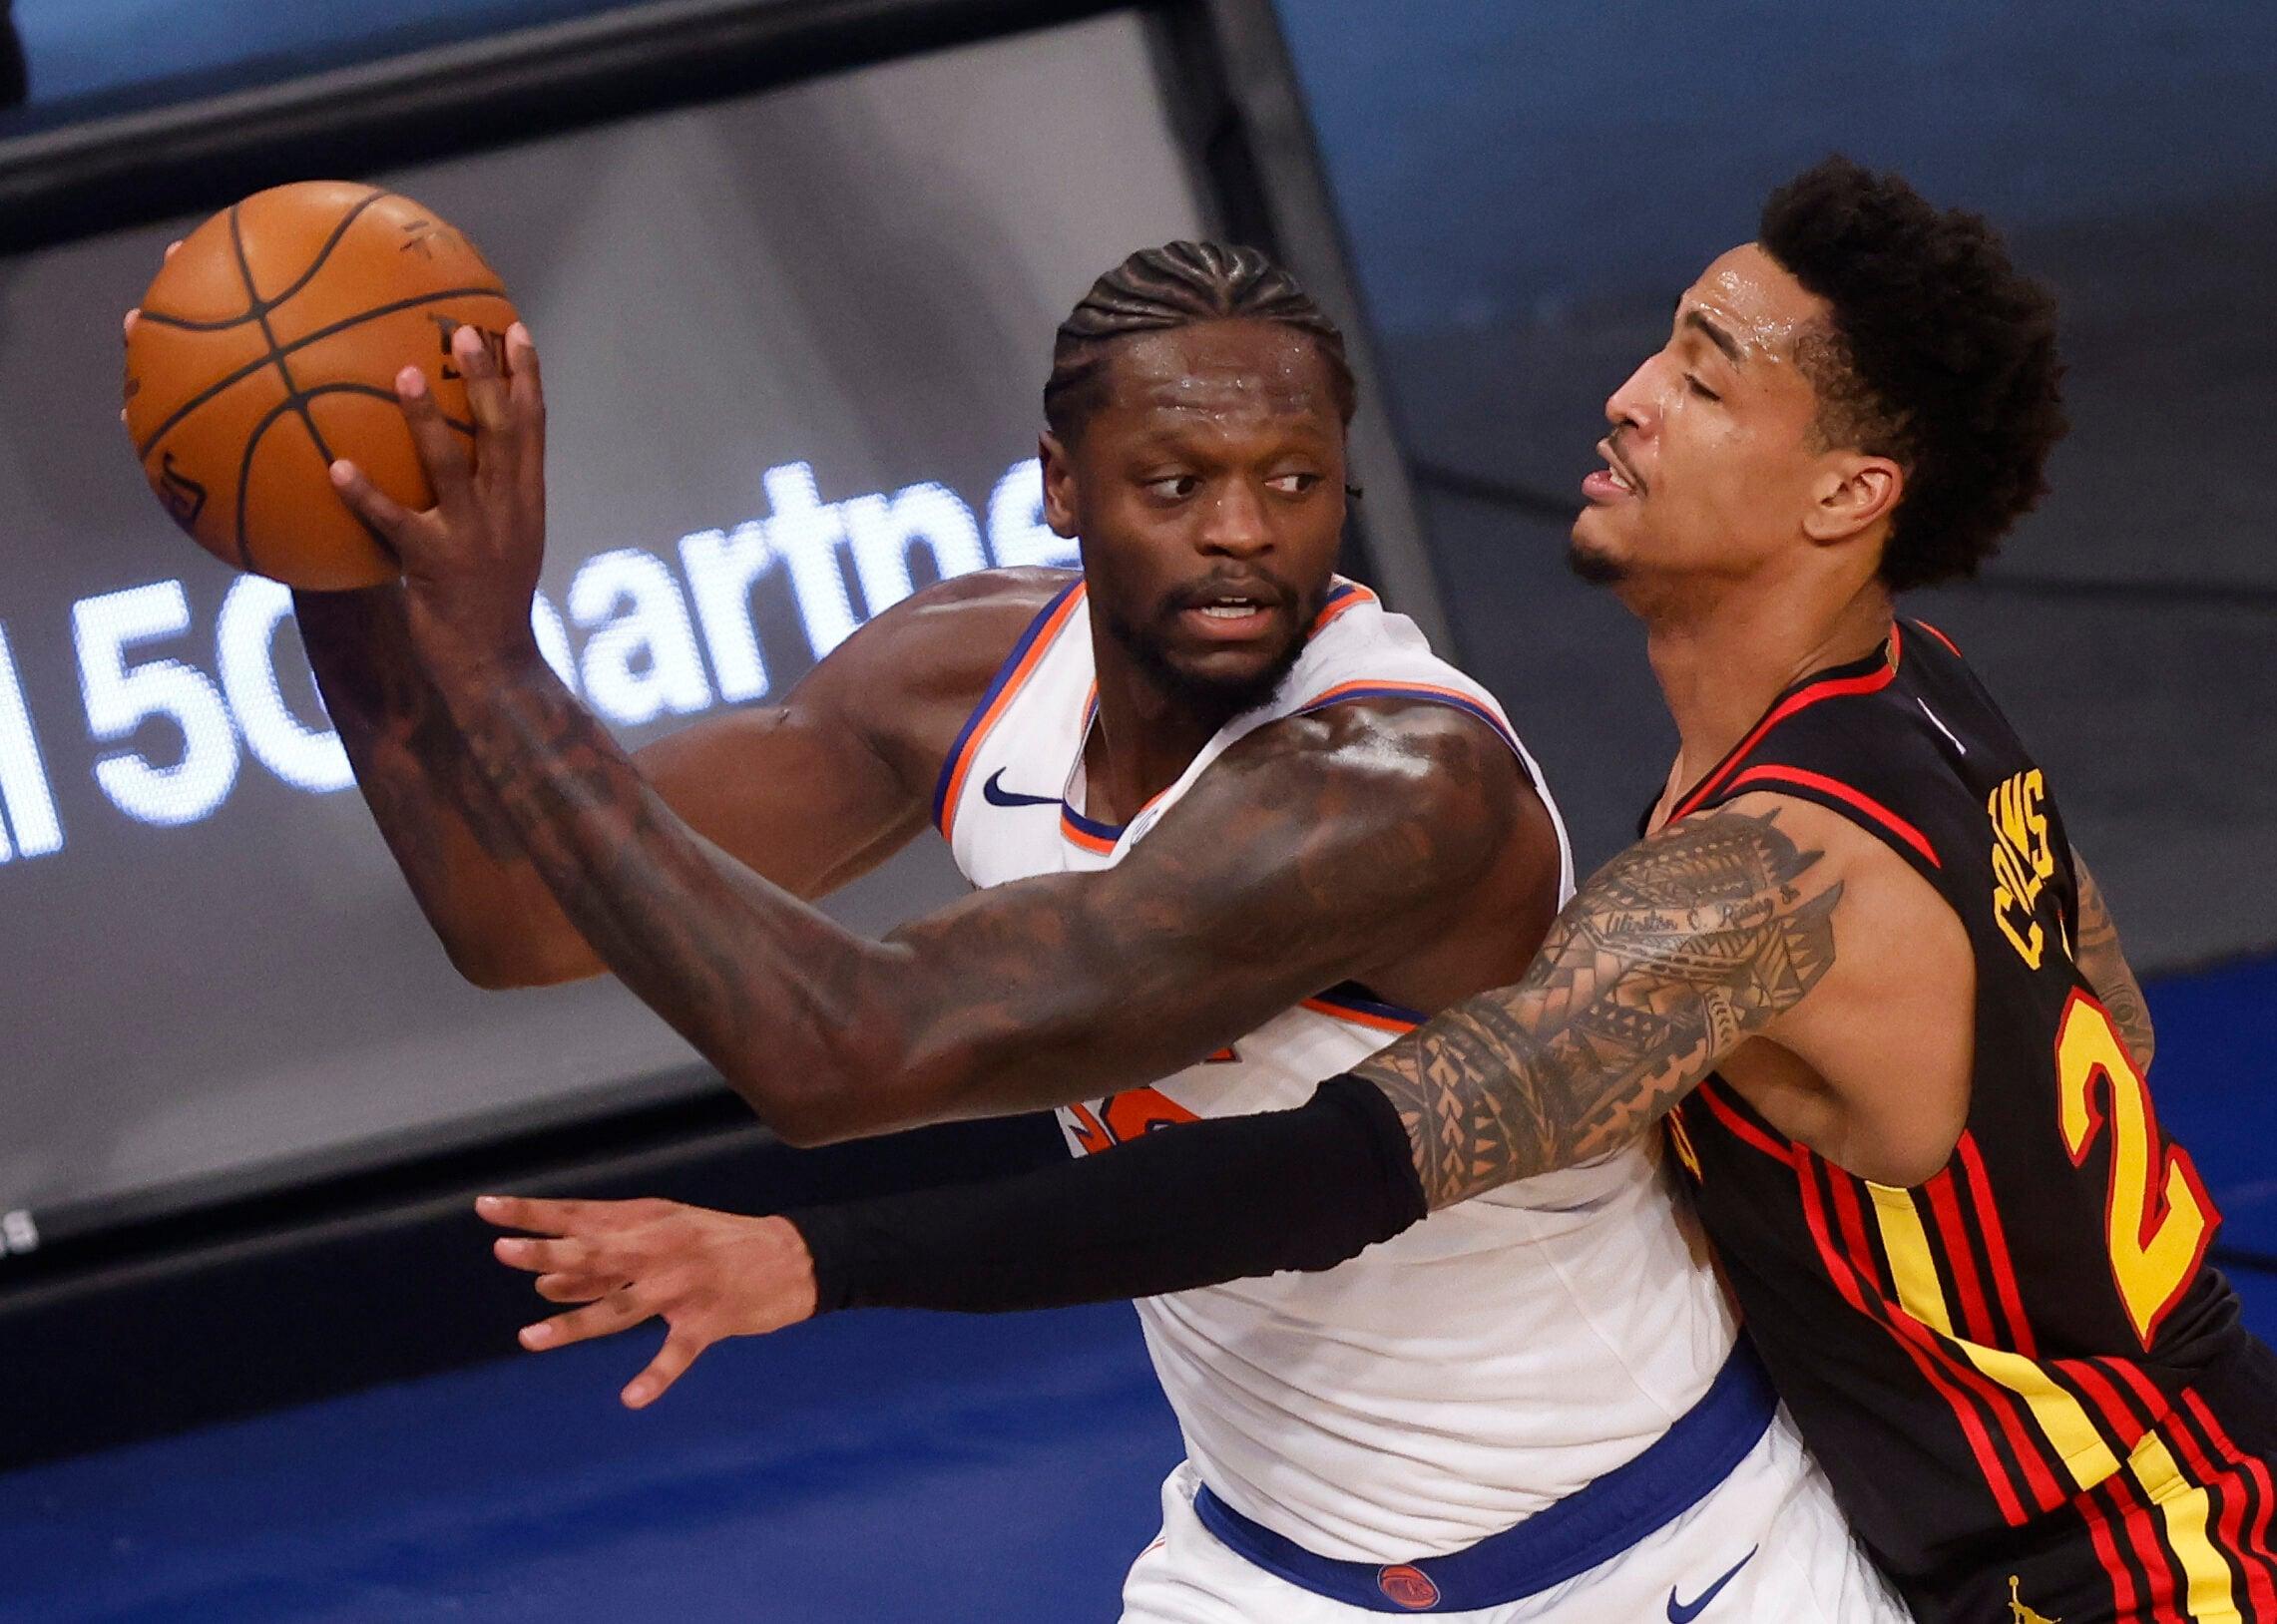 Numbers preview: Knicks (4) vs. Hawks (5)